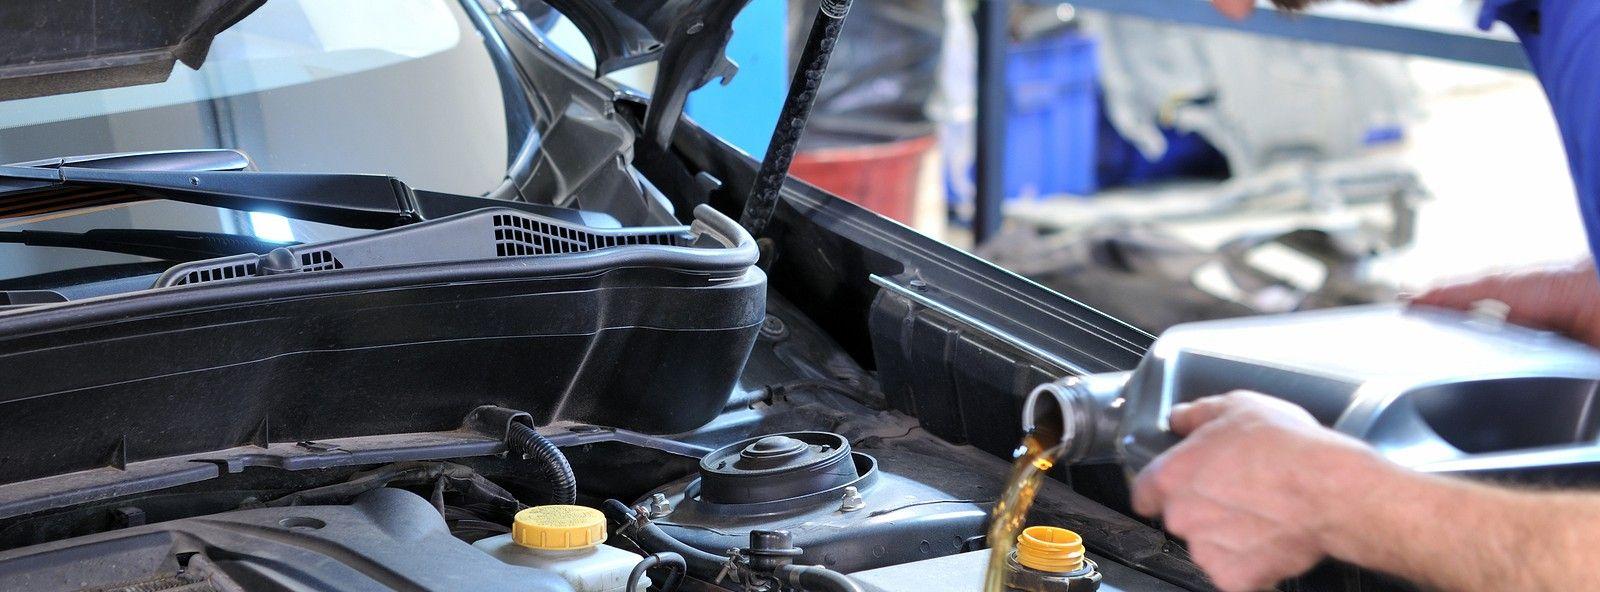 Pin by CarRepairInCA on Car Repair in Fontana CA Car